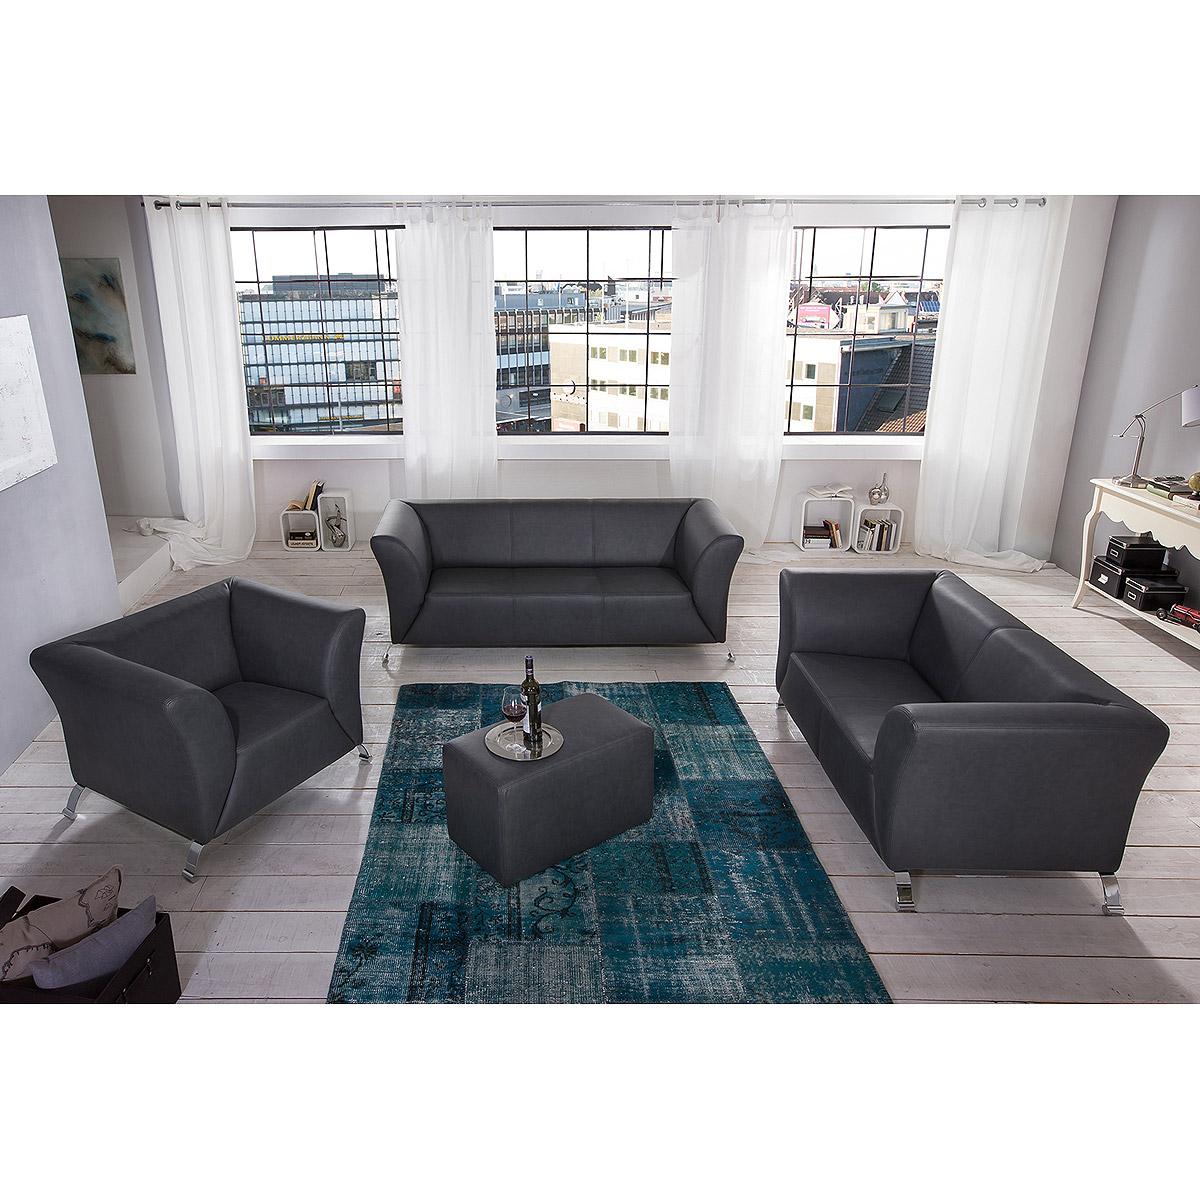 sofagarnitur torino garnitur sofa 3 2 1 polsterm bel in grau ebay. Black Bedroom Furniture Sets. Home Design Ideas